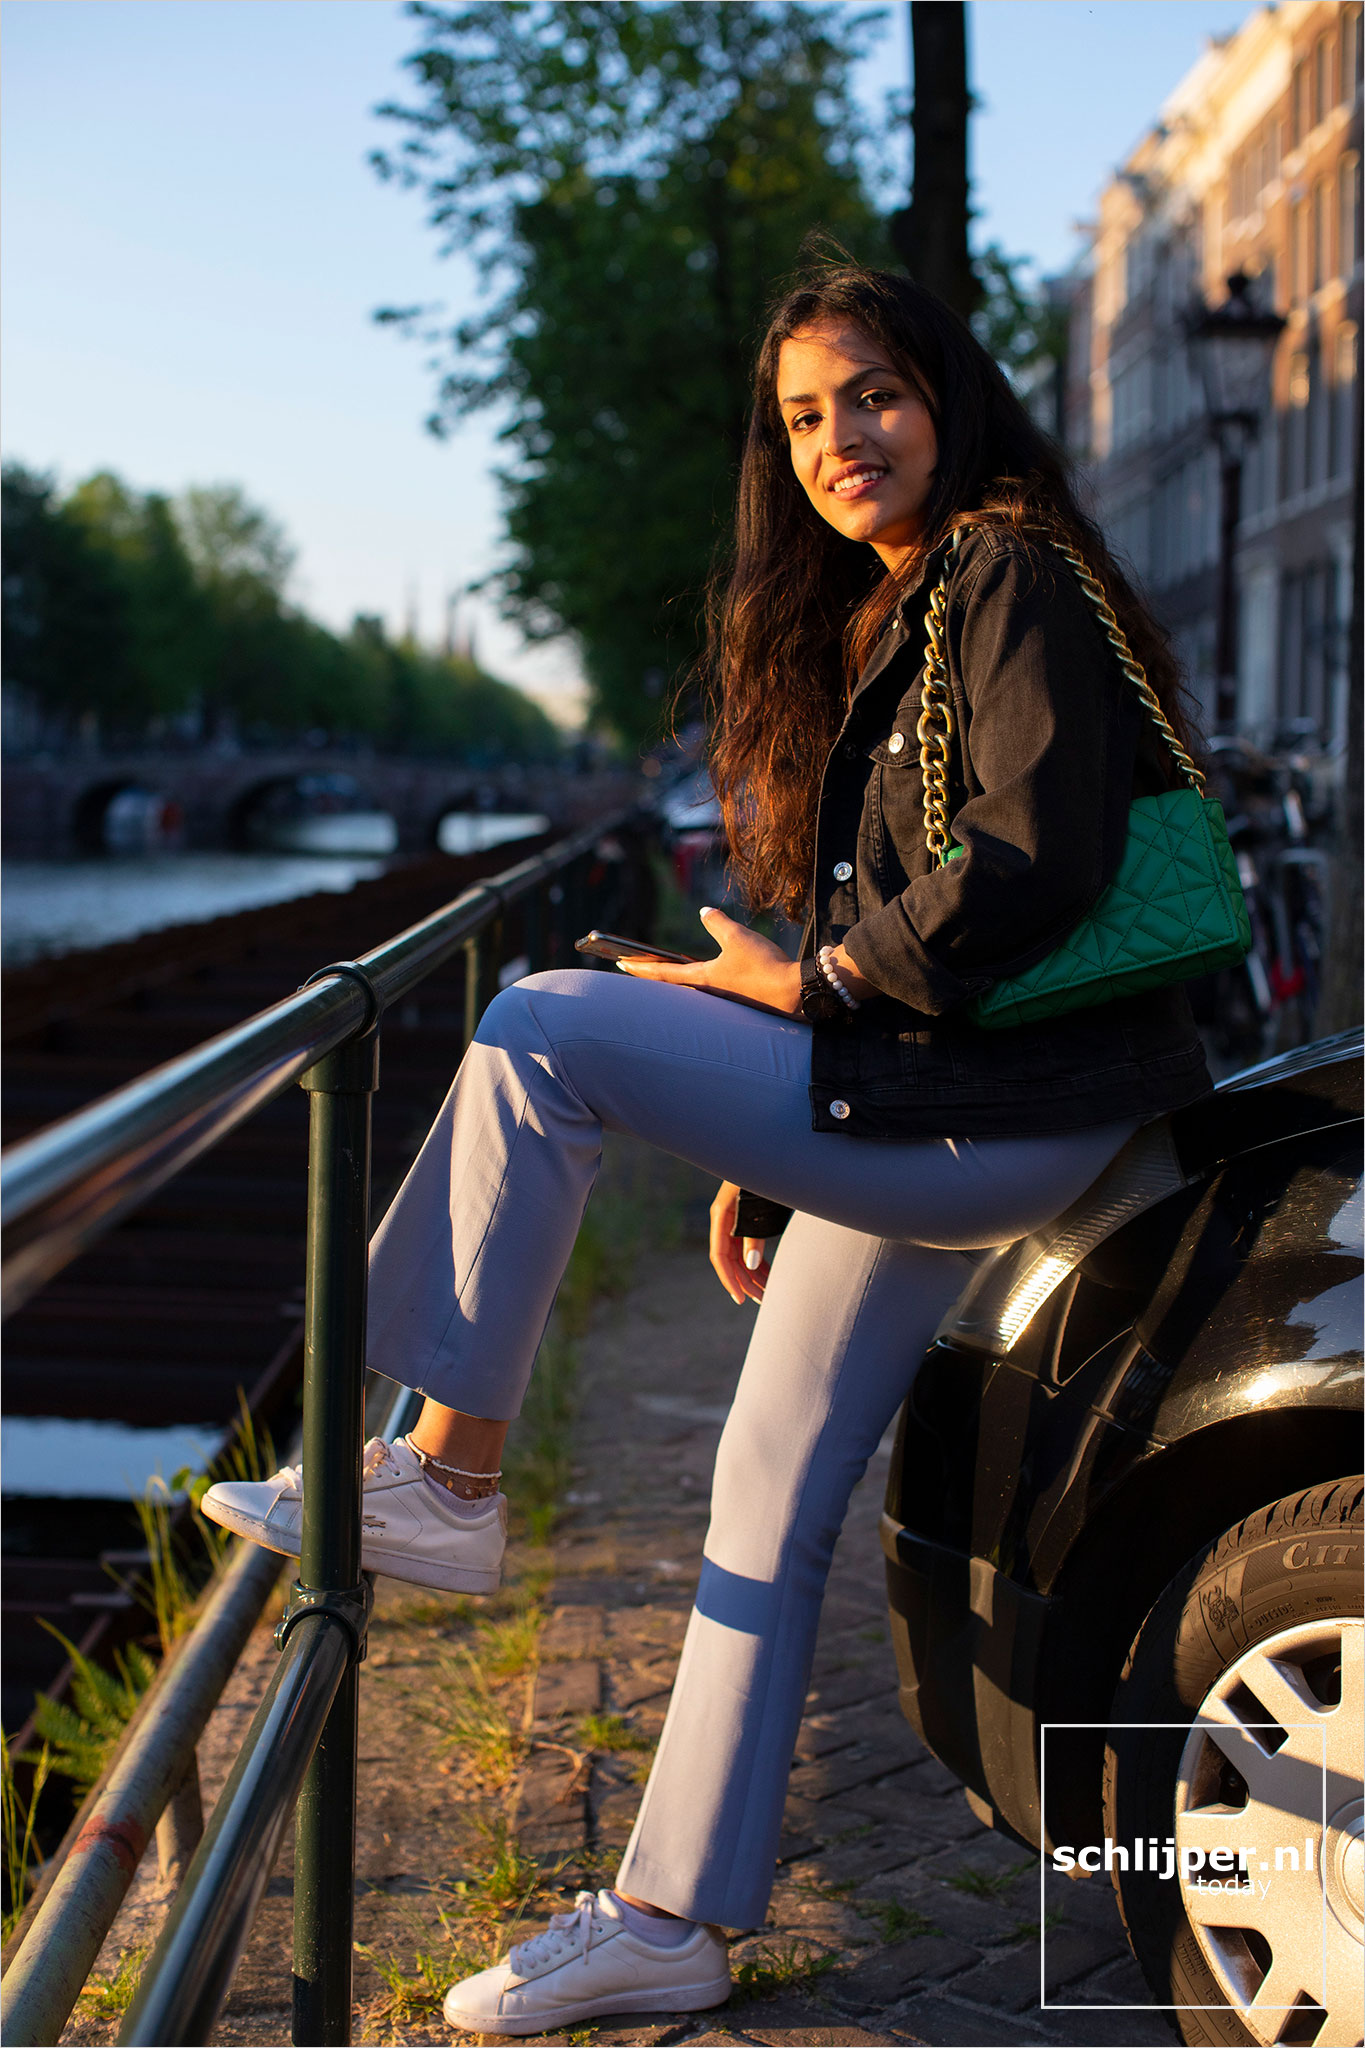 The Netherlands, Amsterdam 7 juni 2021